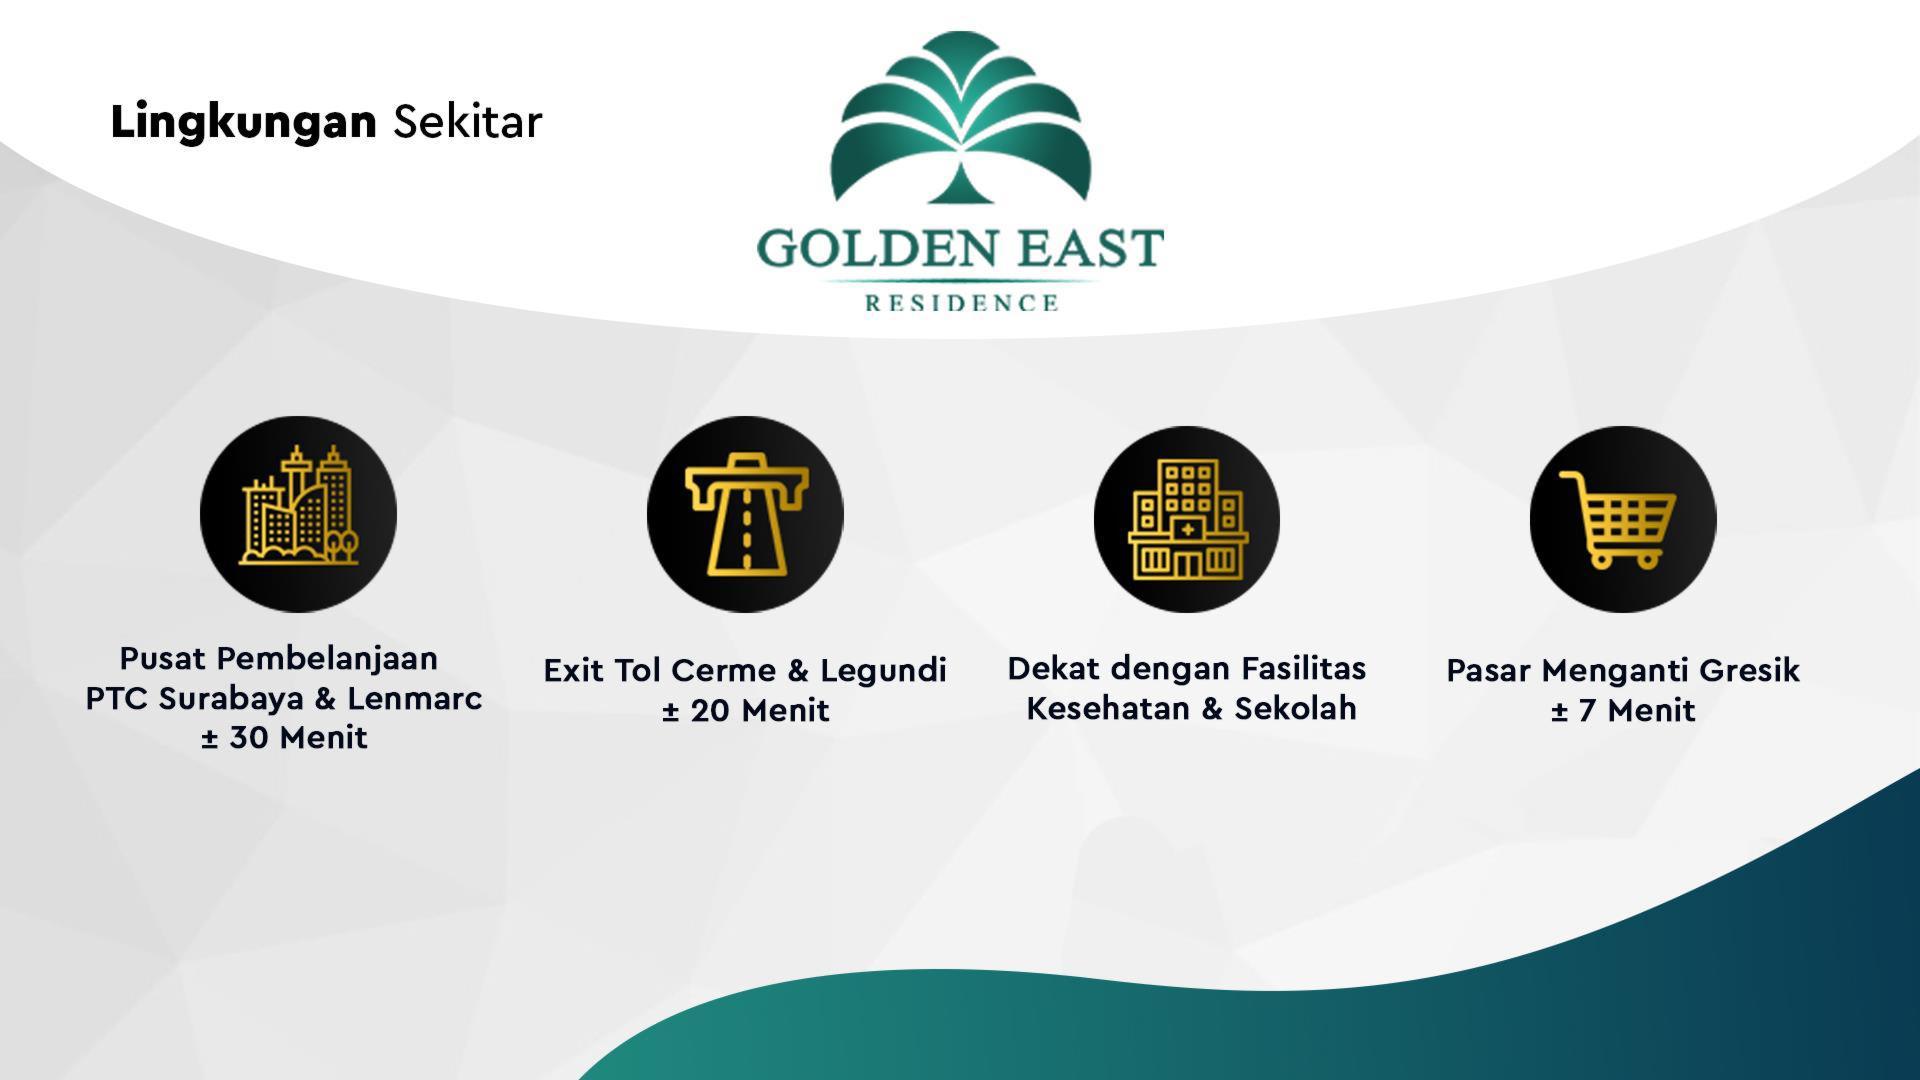 Golden East Residence Menganti Gresik Lingkungan